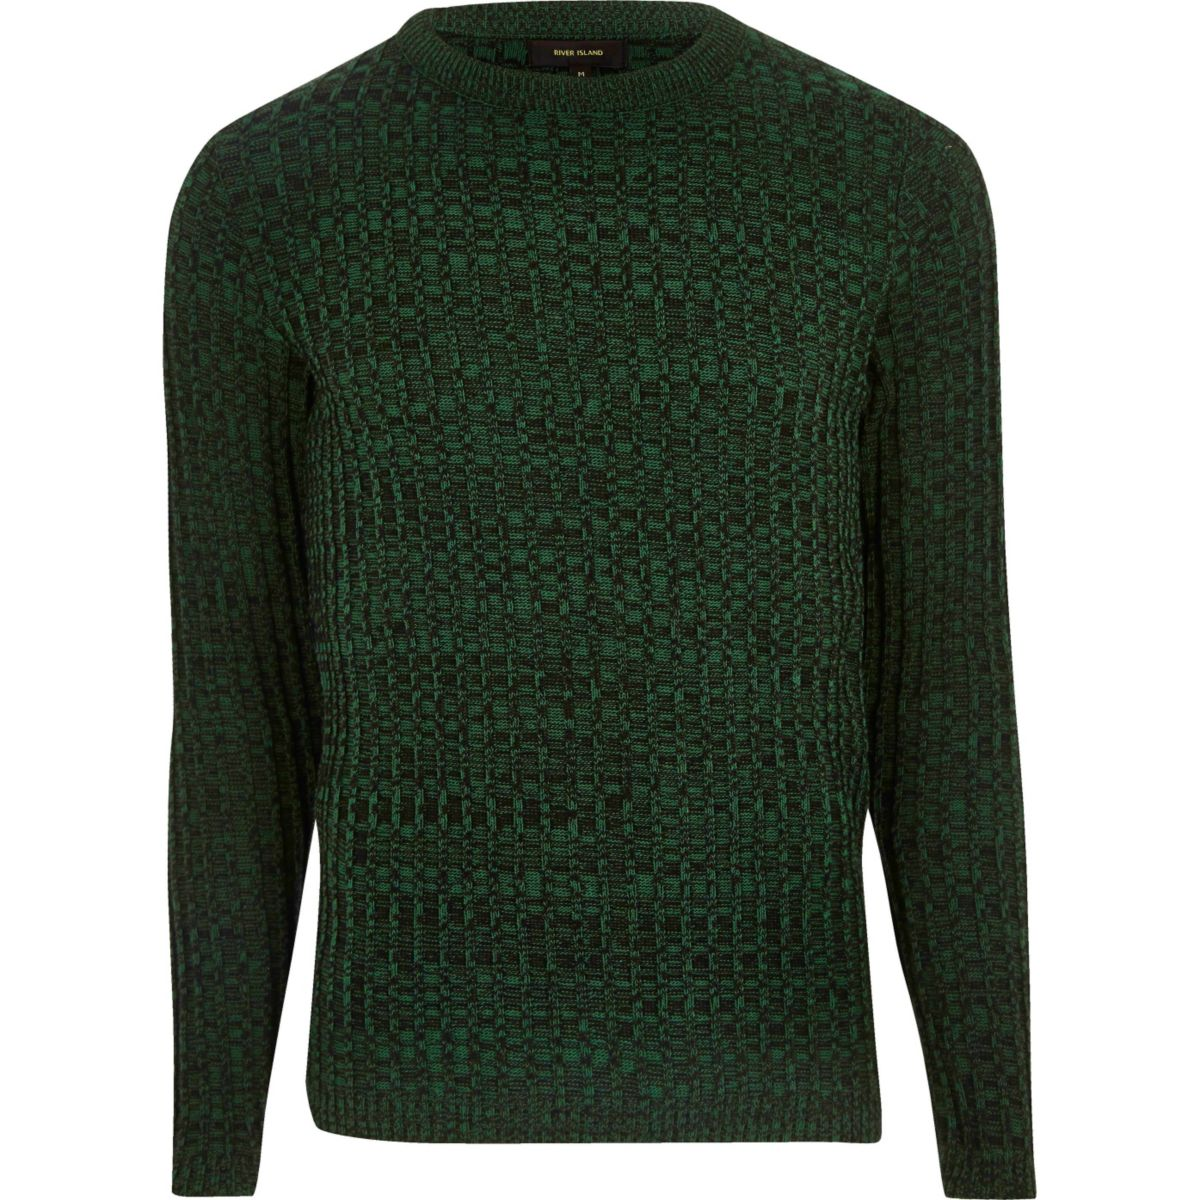 Green ribbed jumper